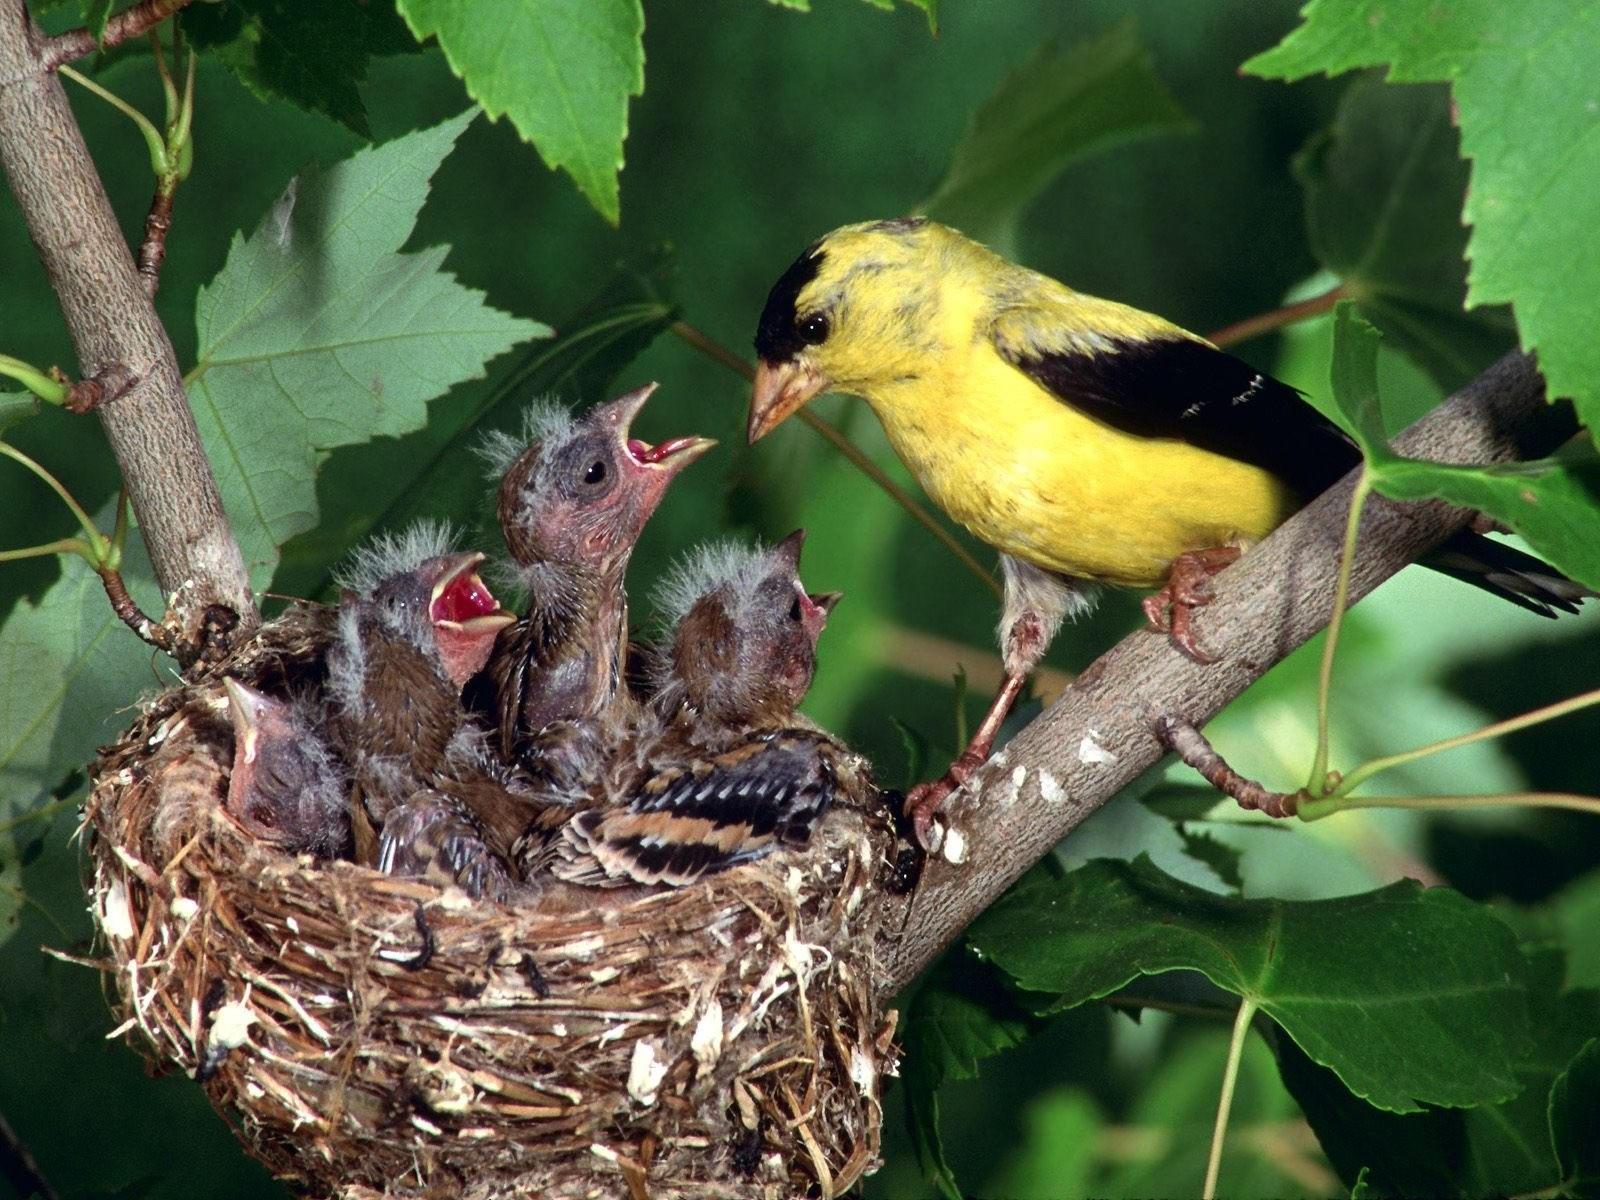 Желто-черная птичка кормит птенцов